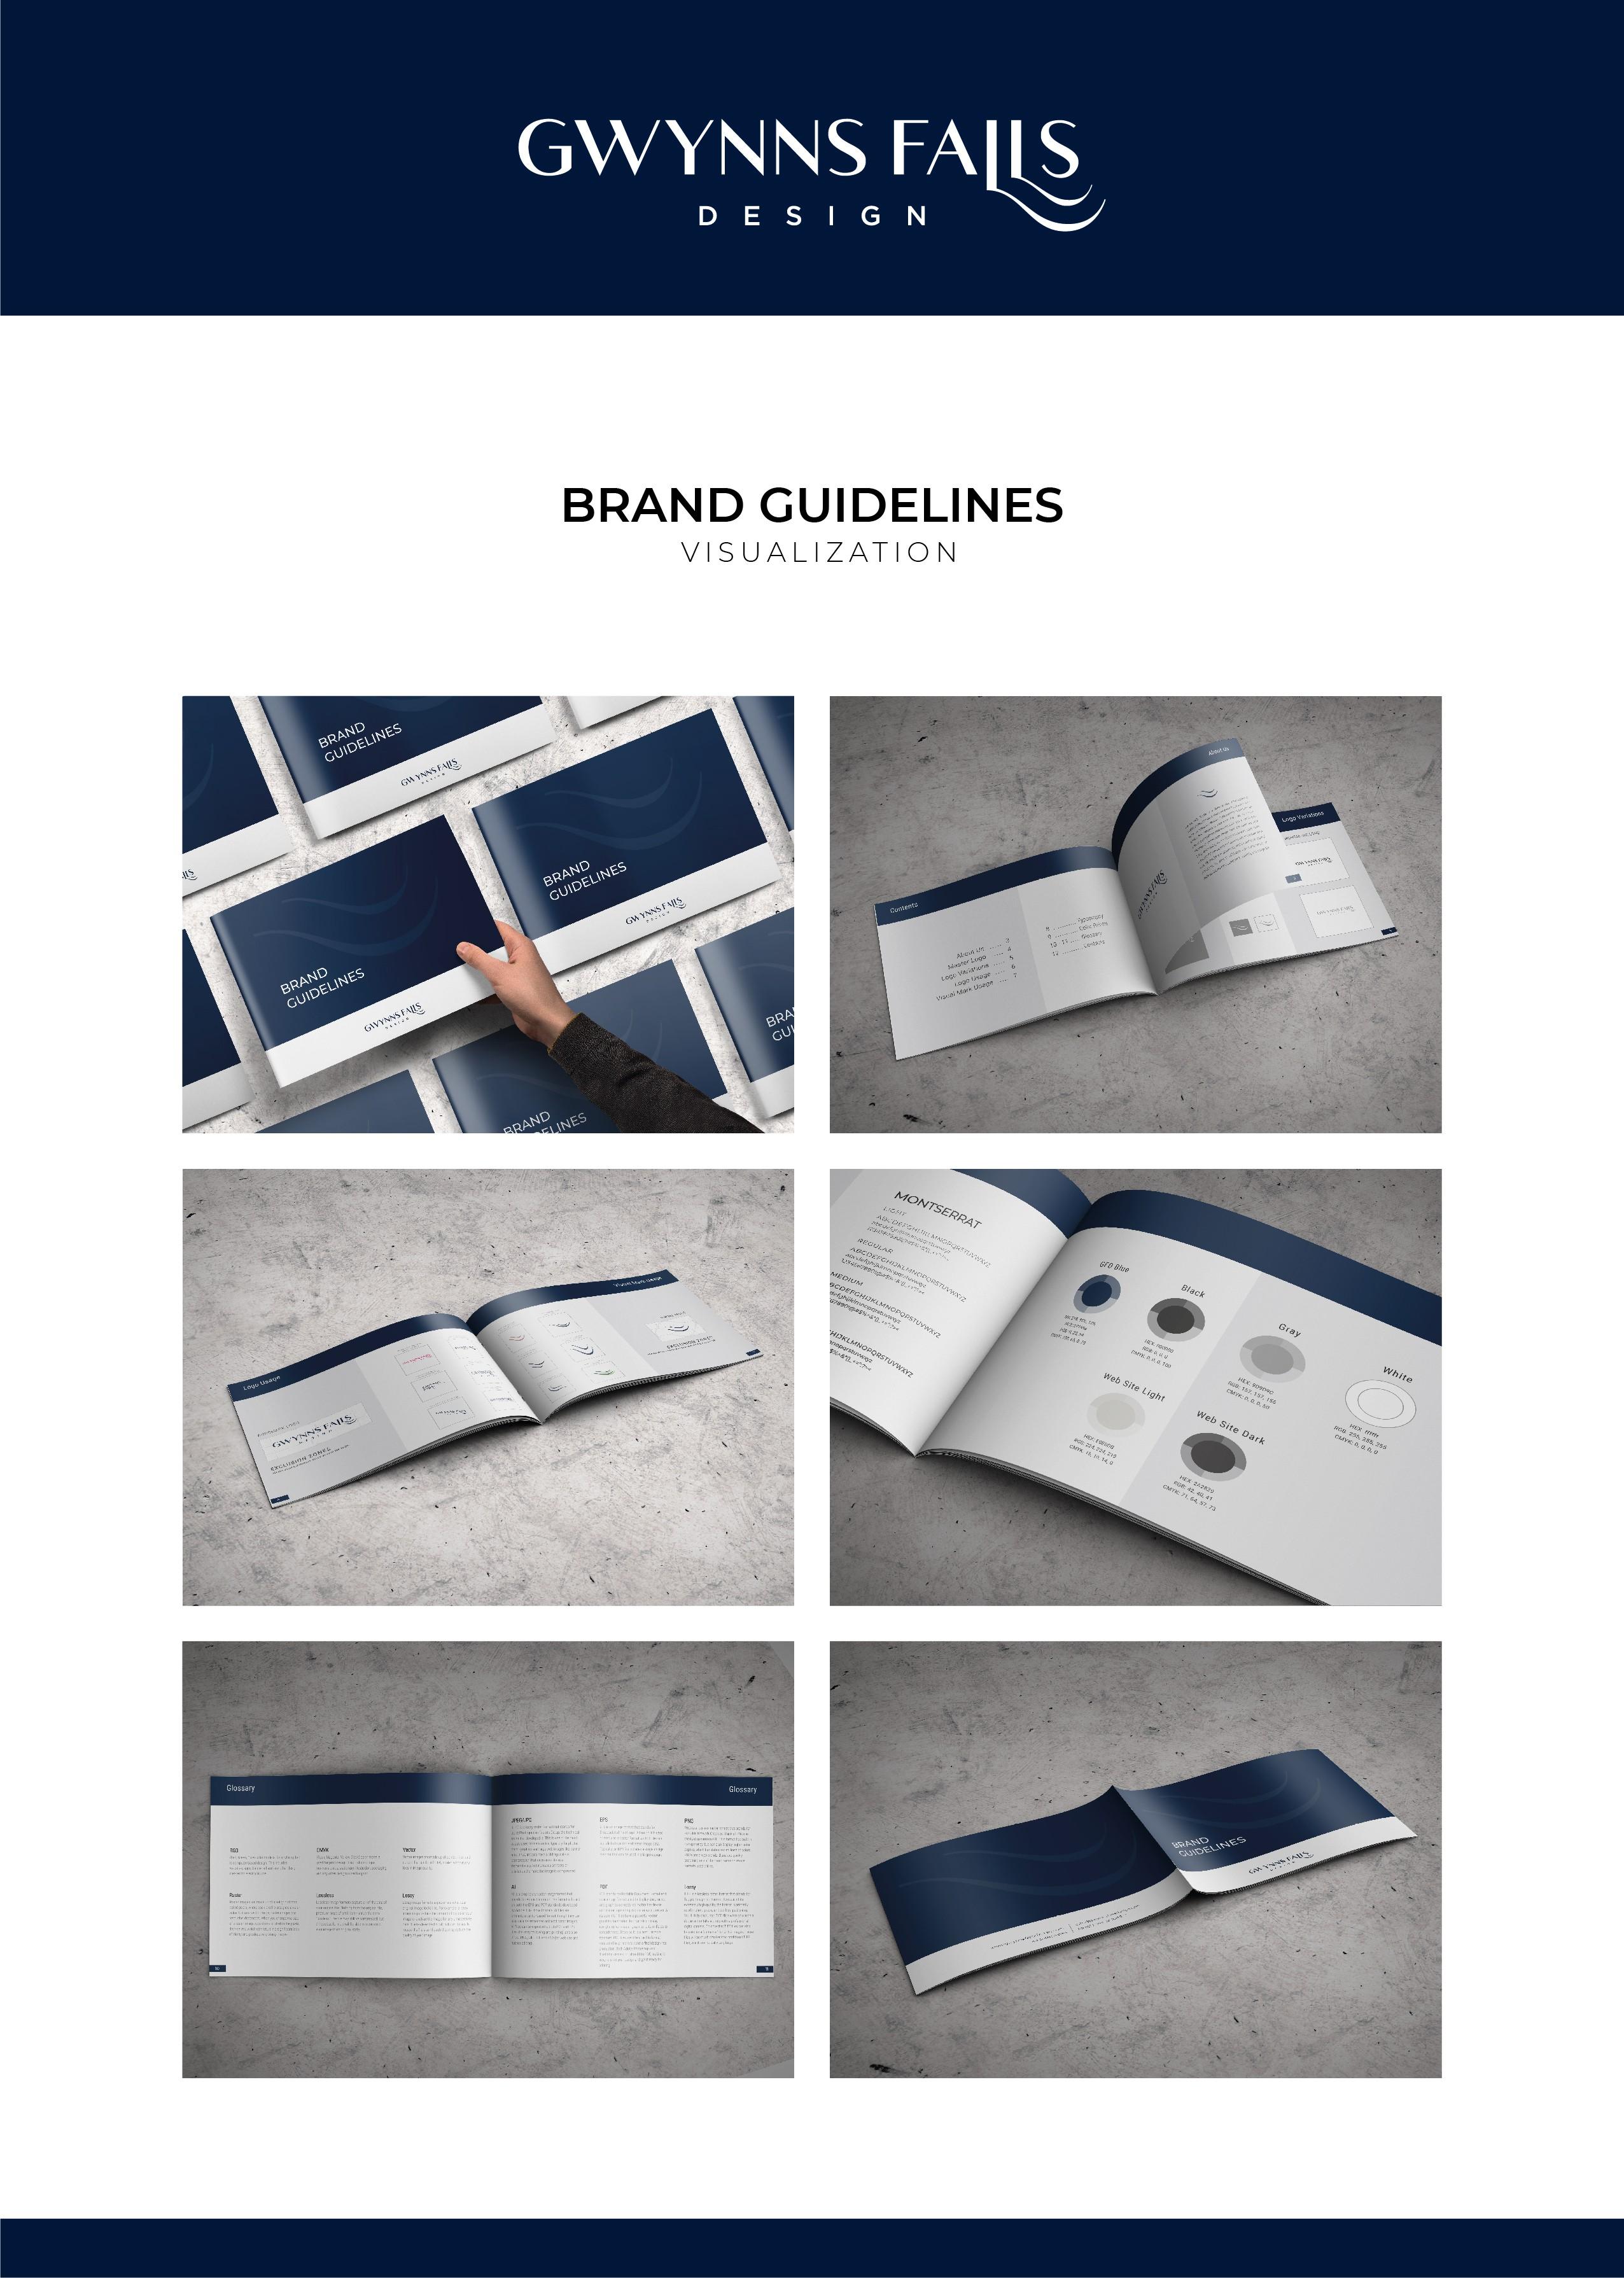 GwynnsFalls Design / Brand Guide / Letterhead / Envelope